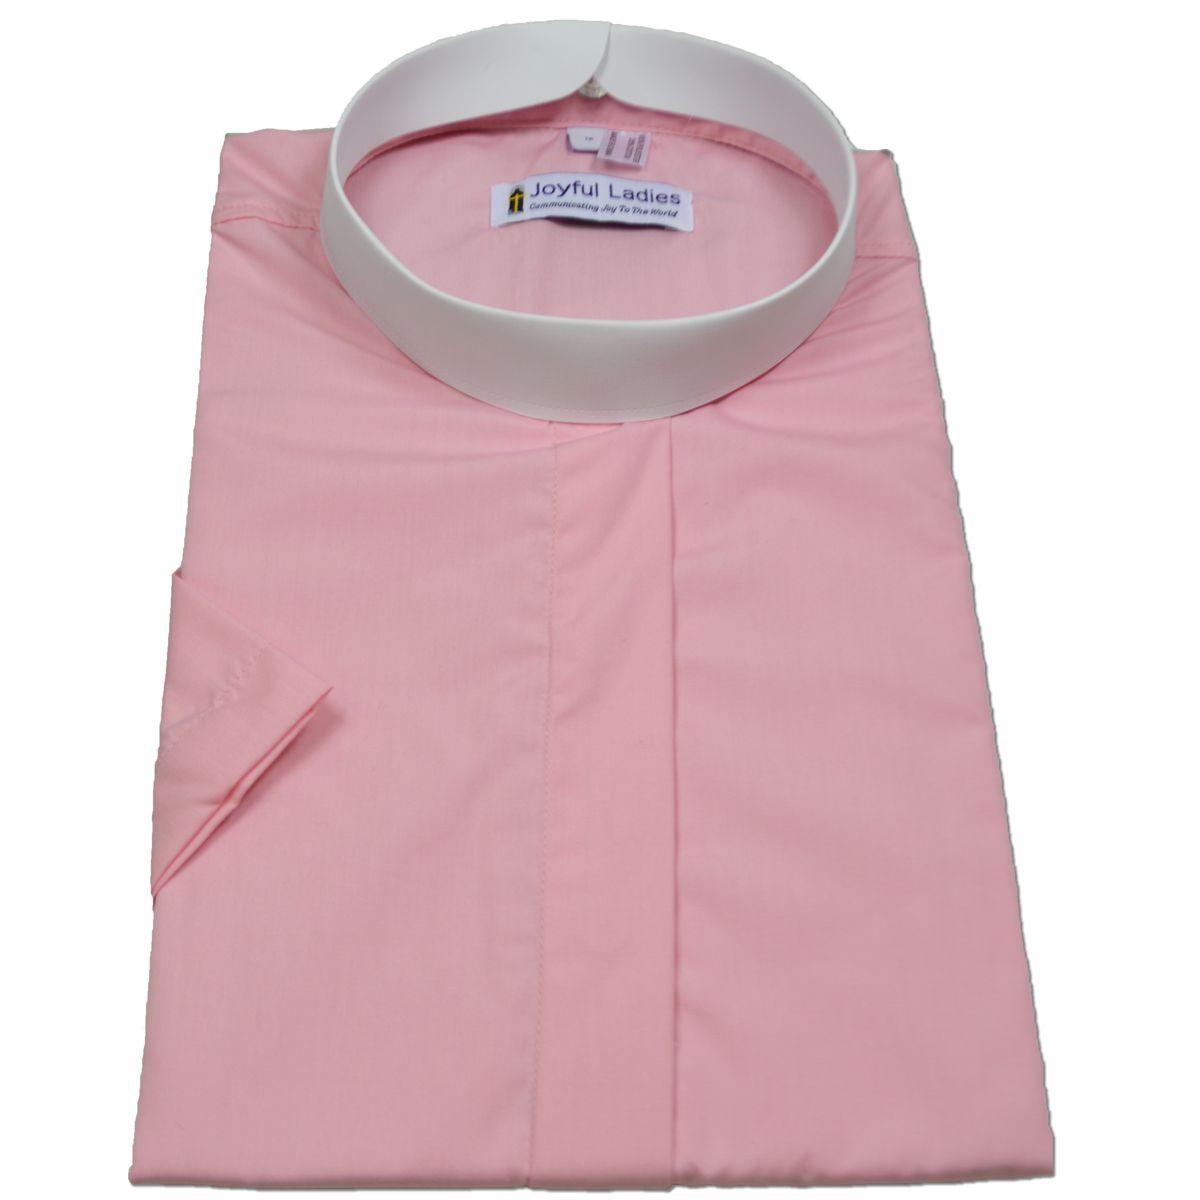 679. Women's Short-Sleeve (Banded) Full-Collar Clergy Shirt - Pink